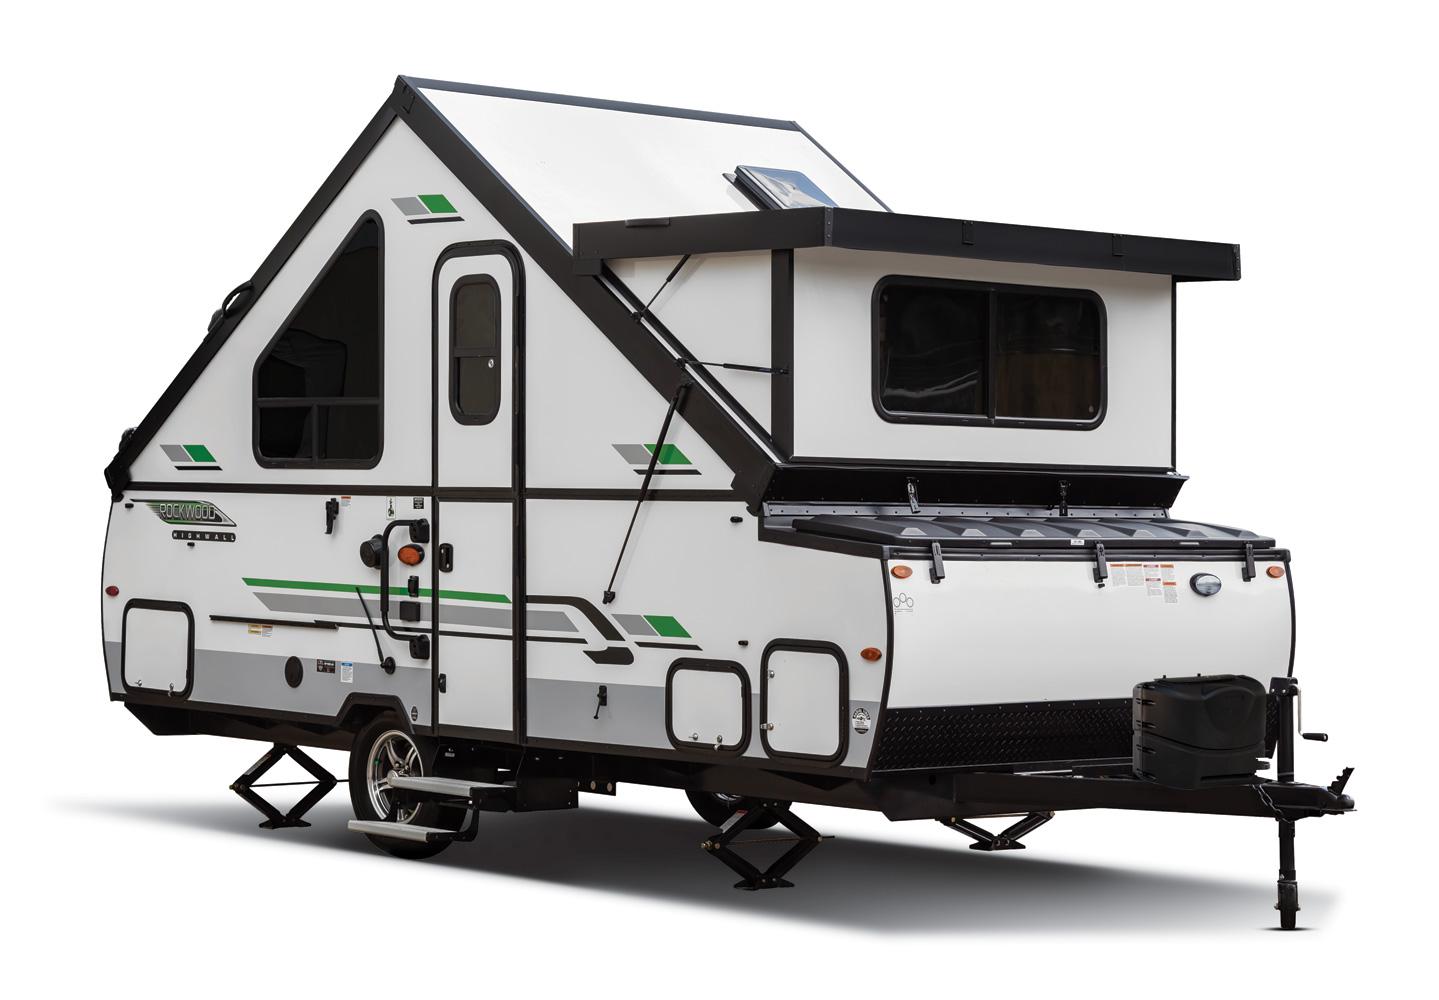 Rockwood Hard Side Pop Up Campers Forest River Rv Manufacturer Of Travel Trailers Fifth Wheels Tent Campers Motorhomes